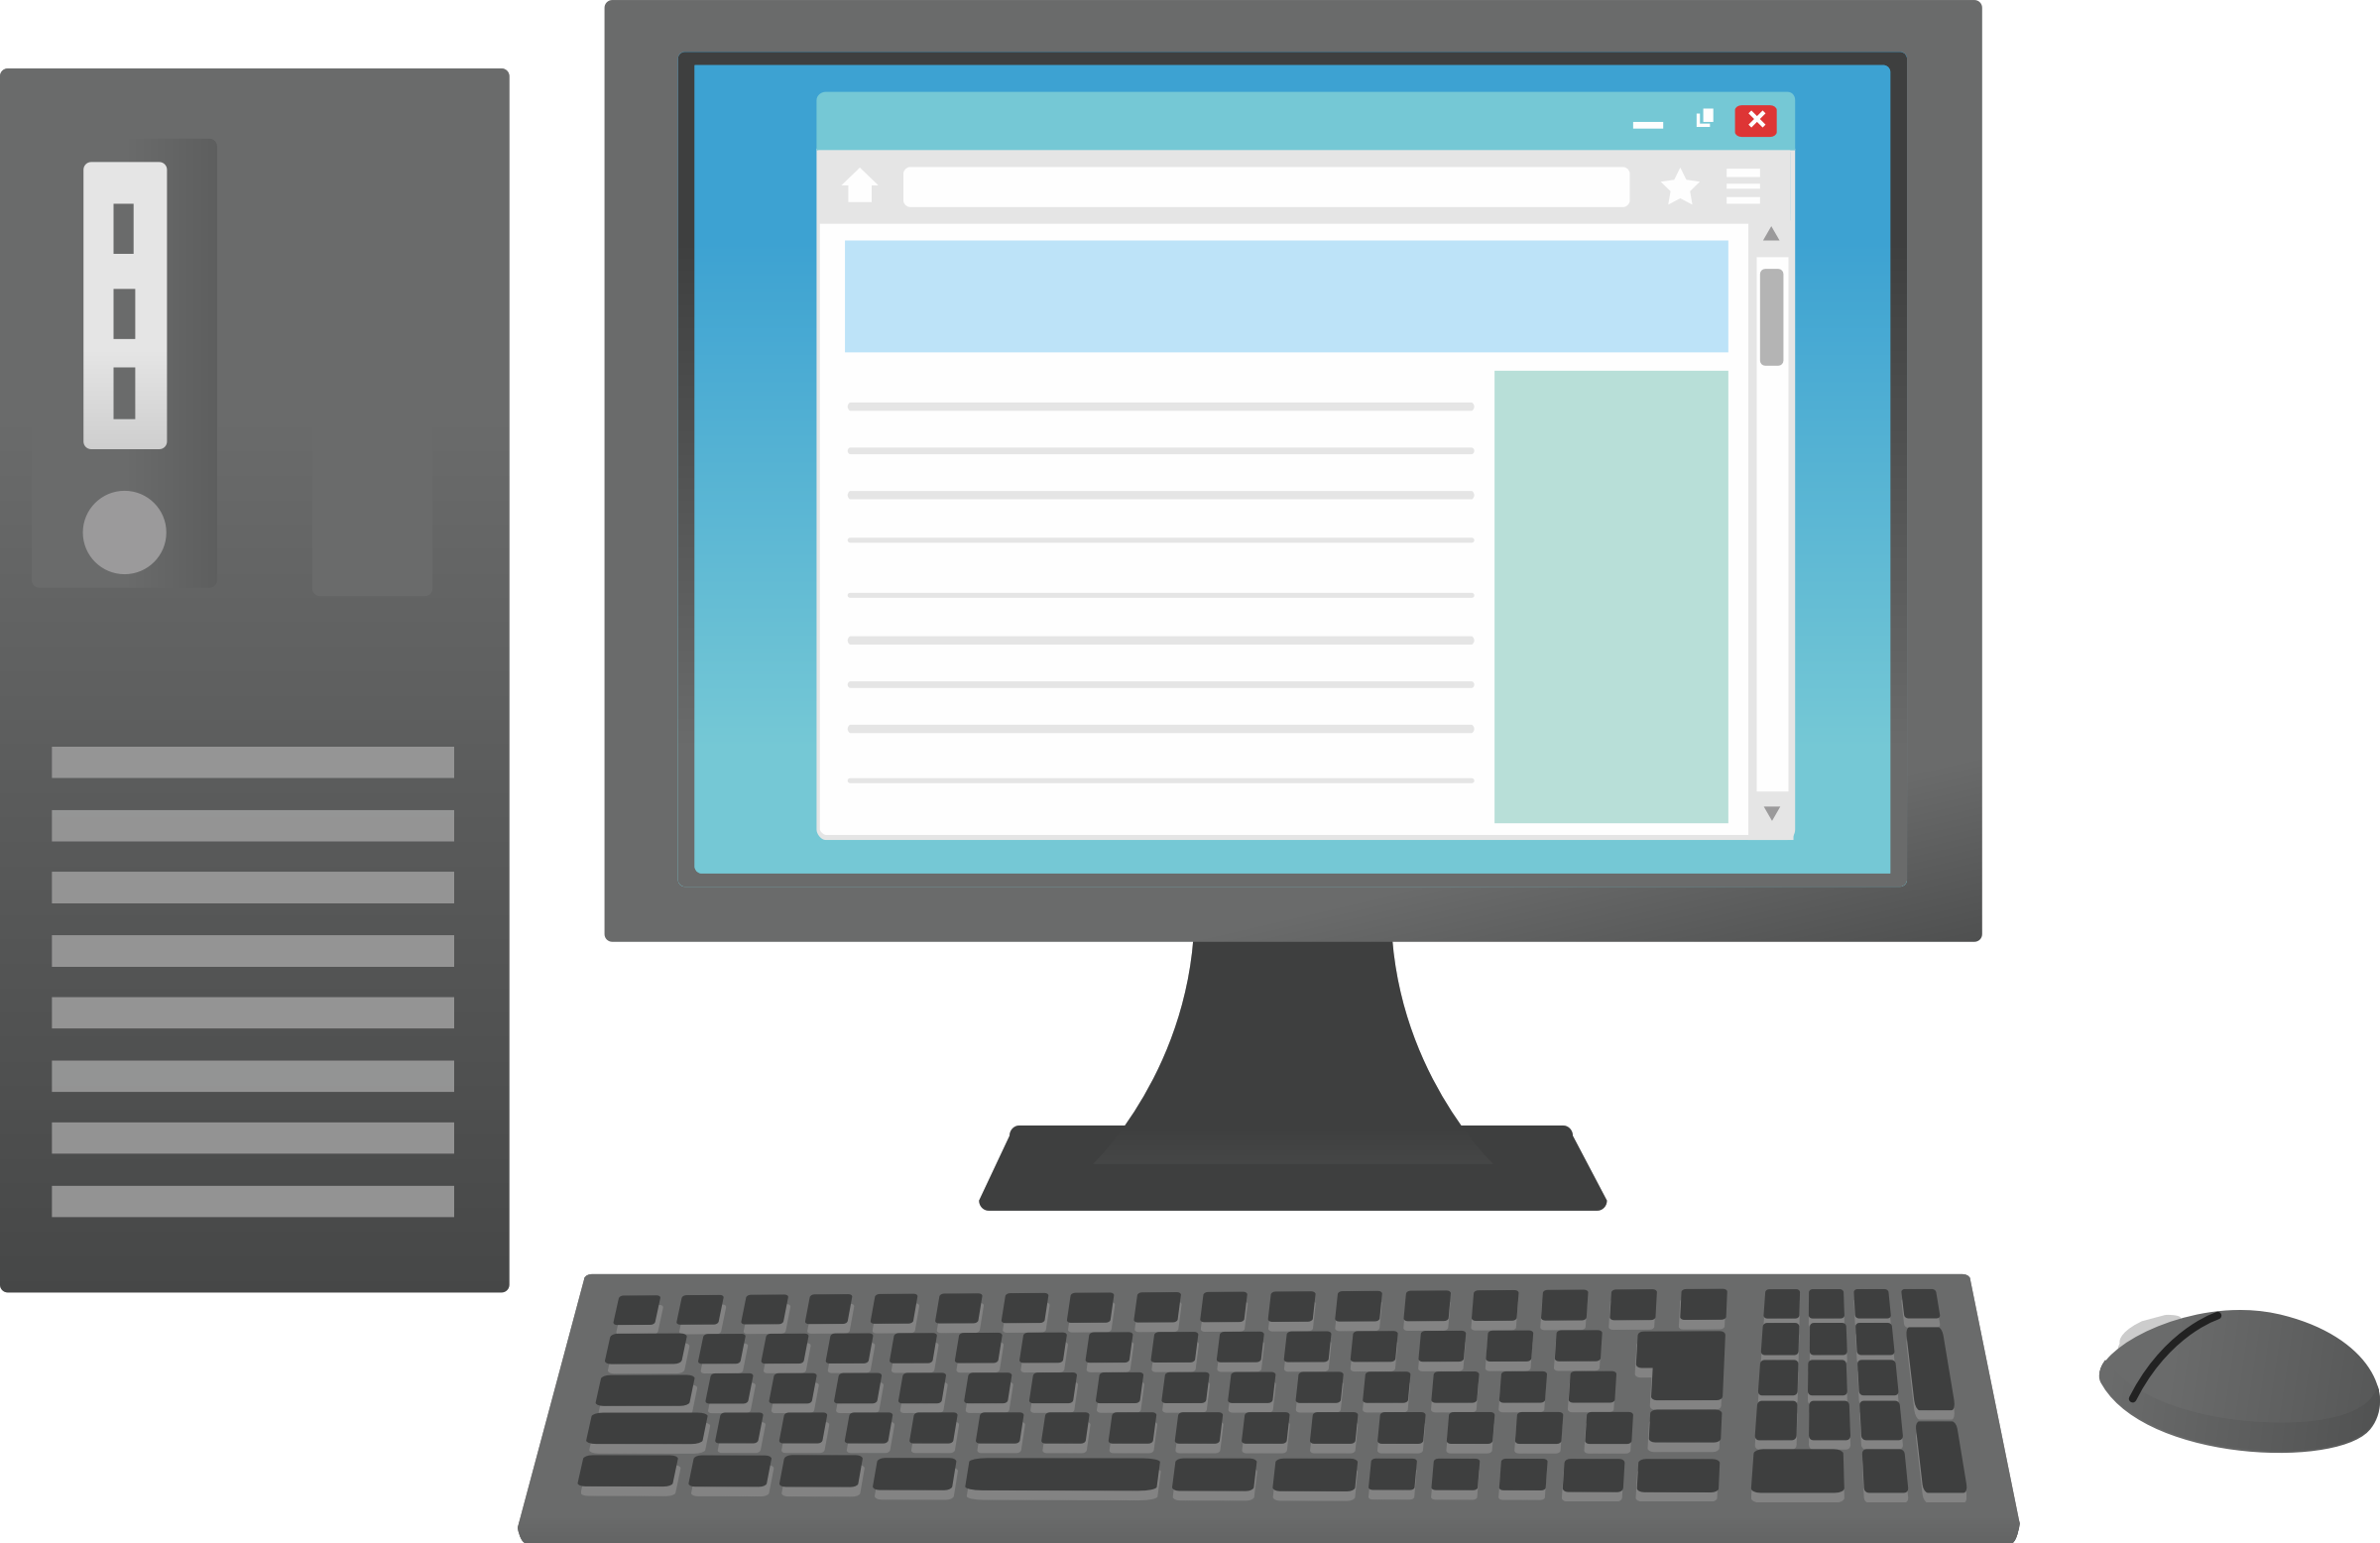 Computer big image png. Pc clipart desktop